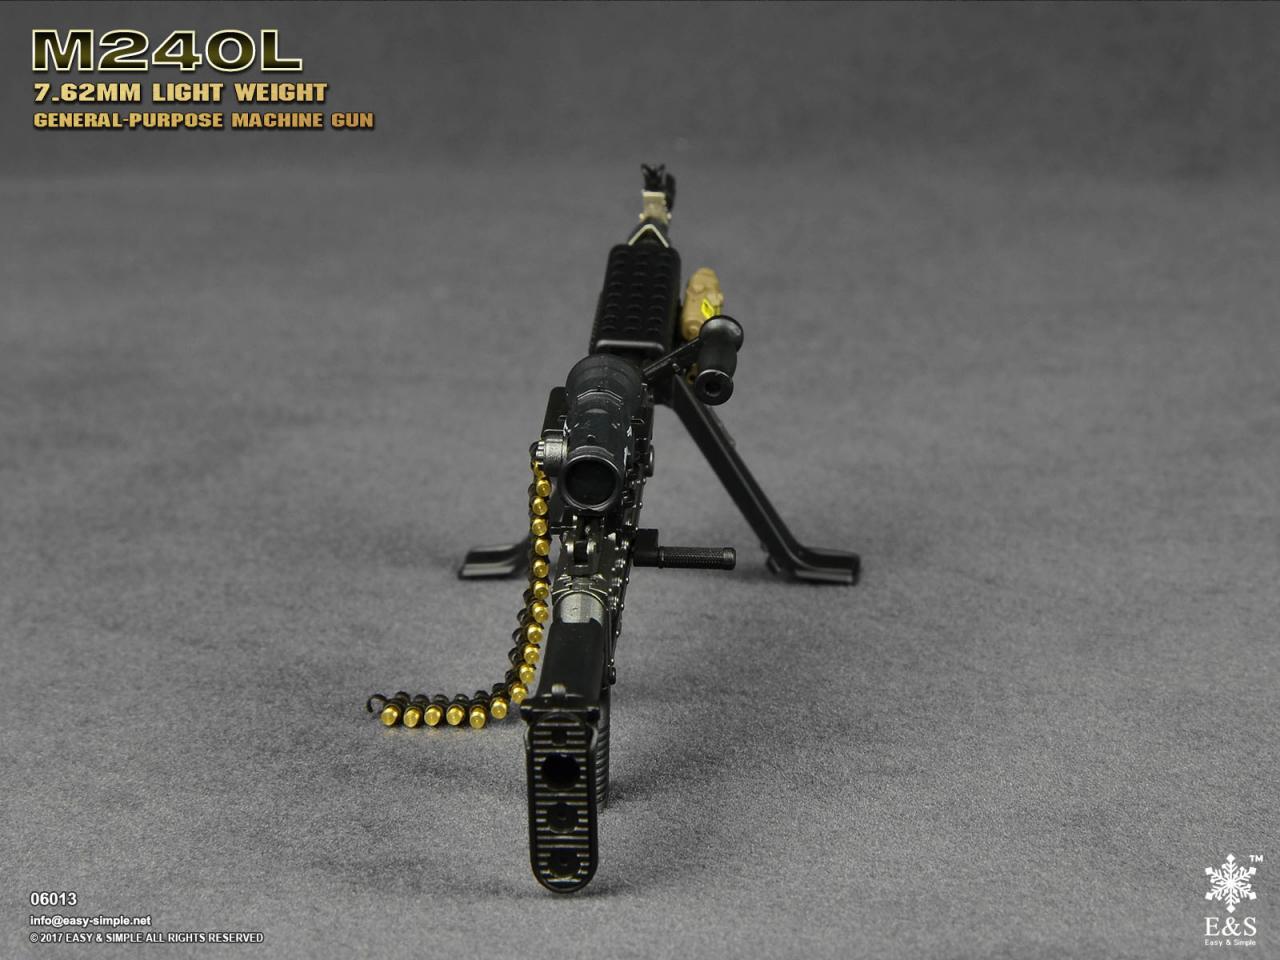 Easy&Simple 06013 M240L 7.62mm Light Weight General Purpose Machine Gun-06013-8-jpg